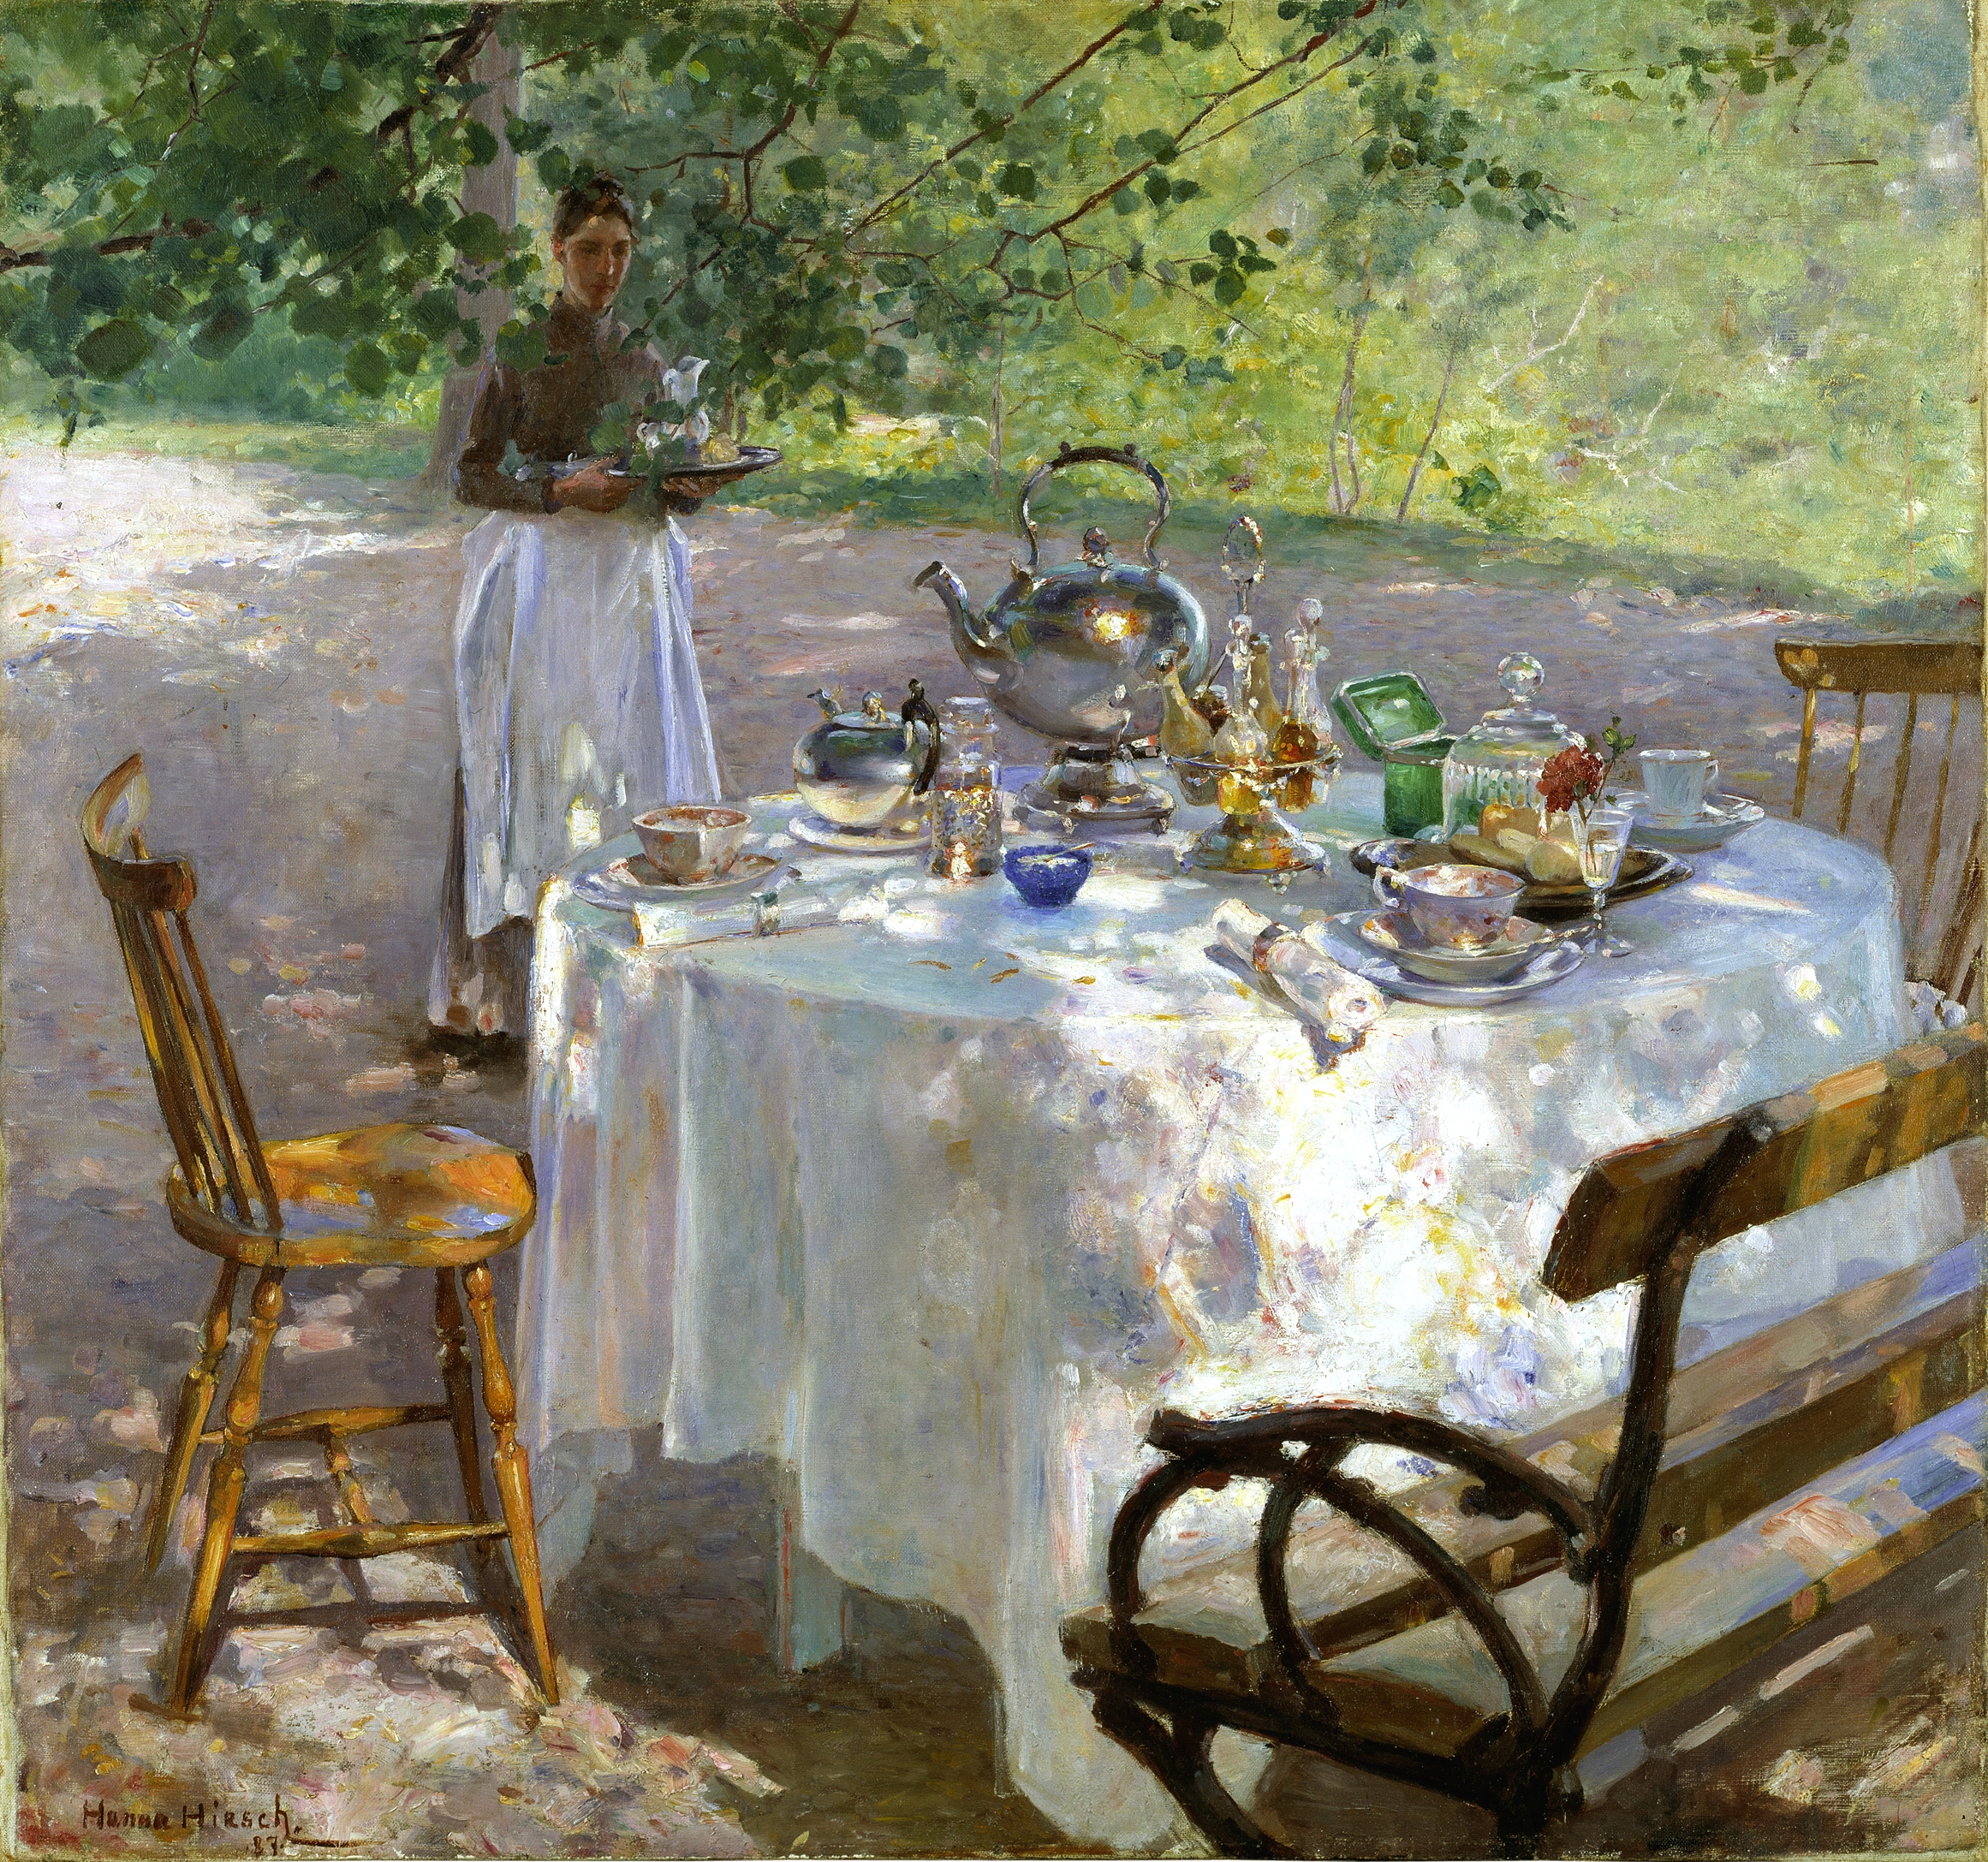 Hanna Pauli - Frukostdags